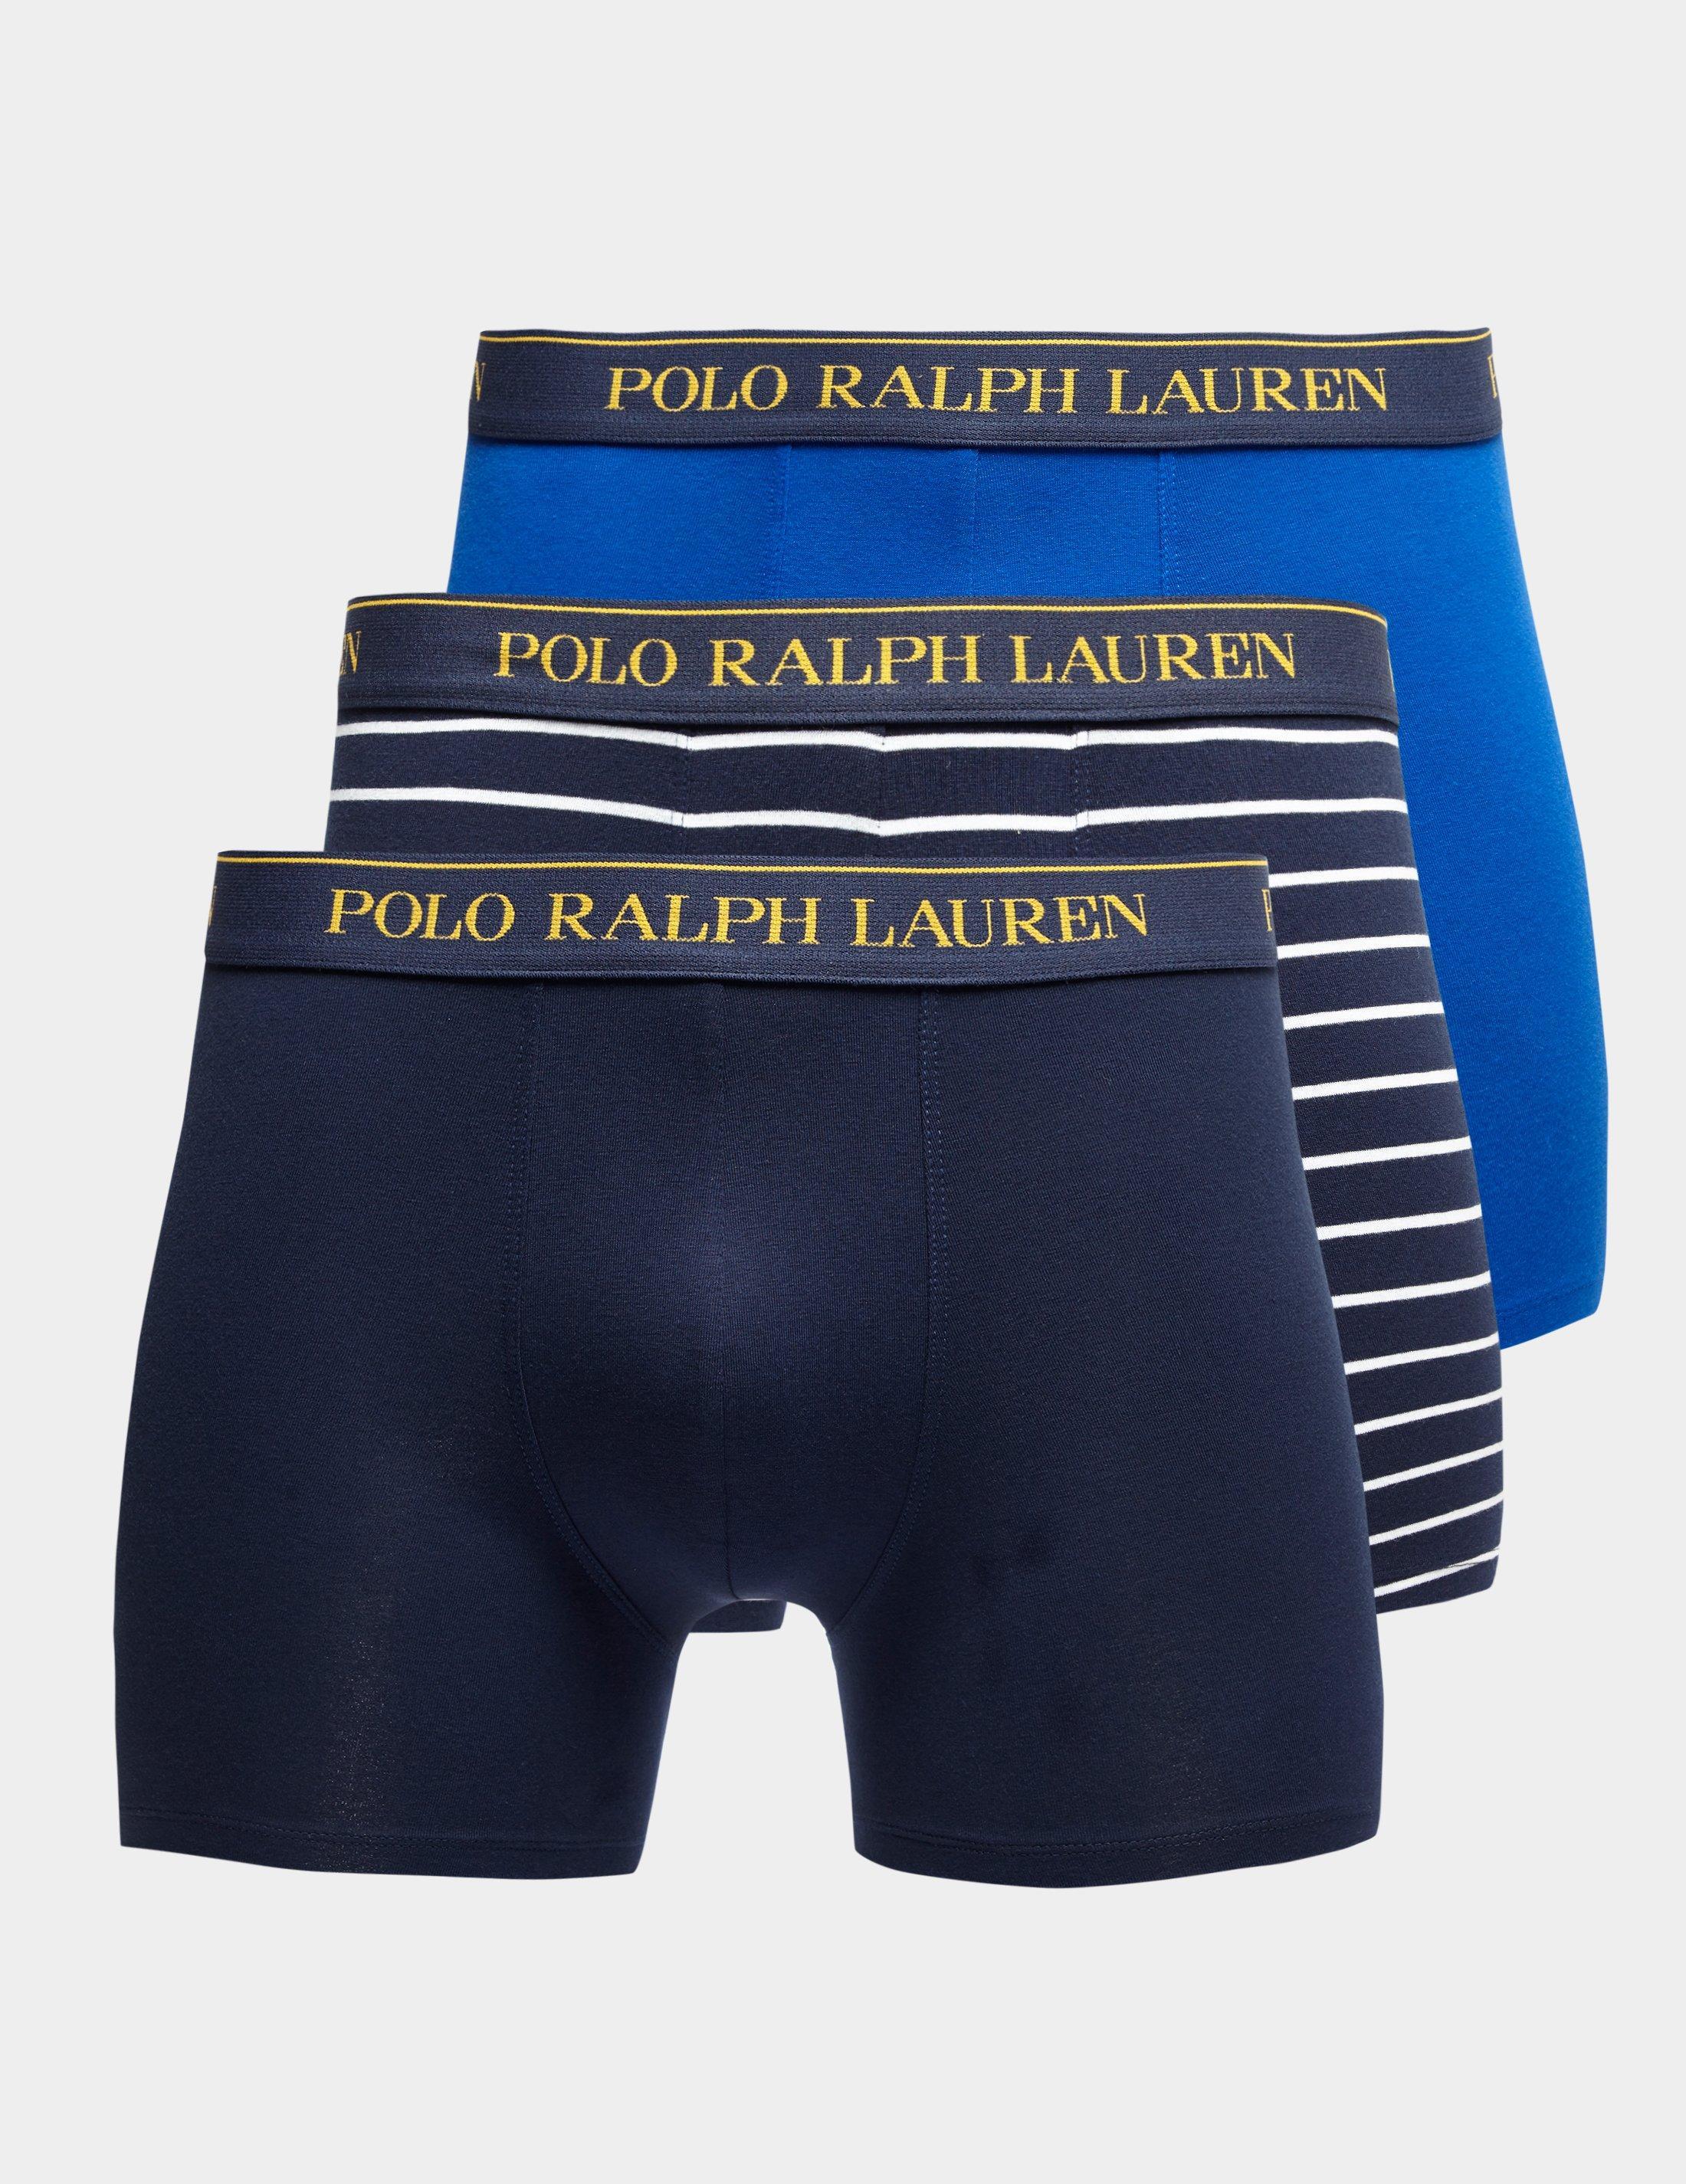 polo ralph lauren black hooded puffa jacket mens polo shirts blue